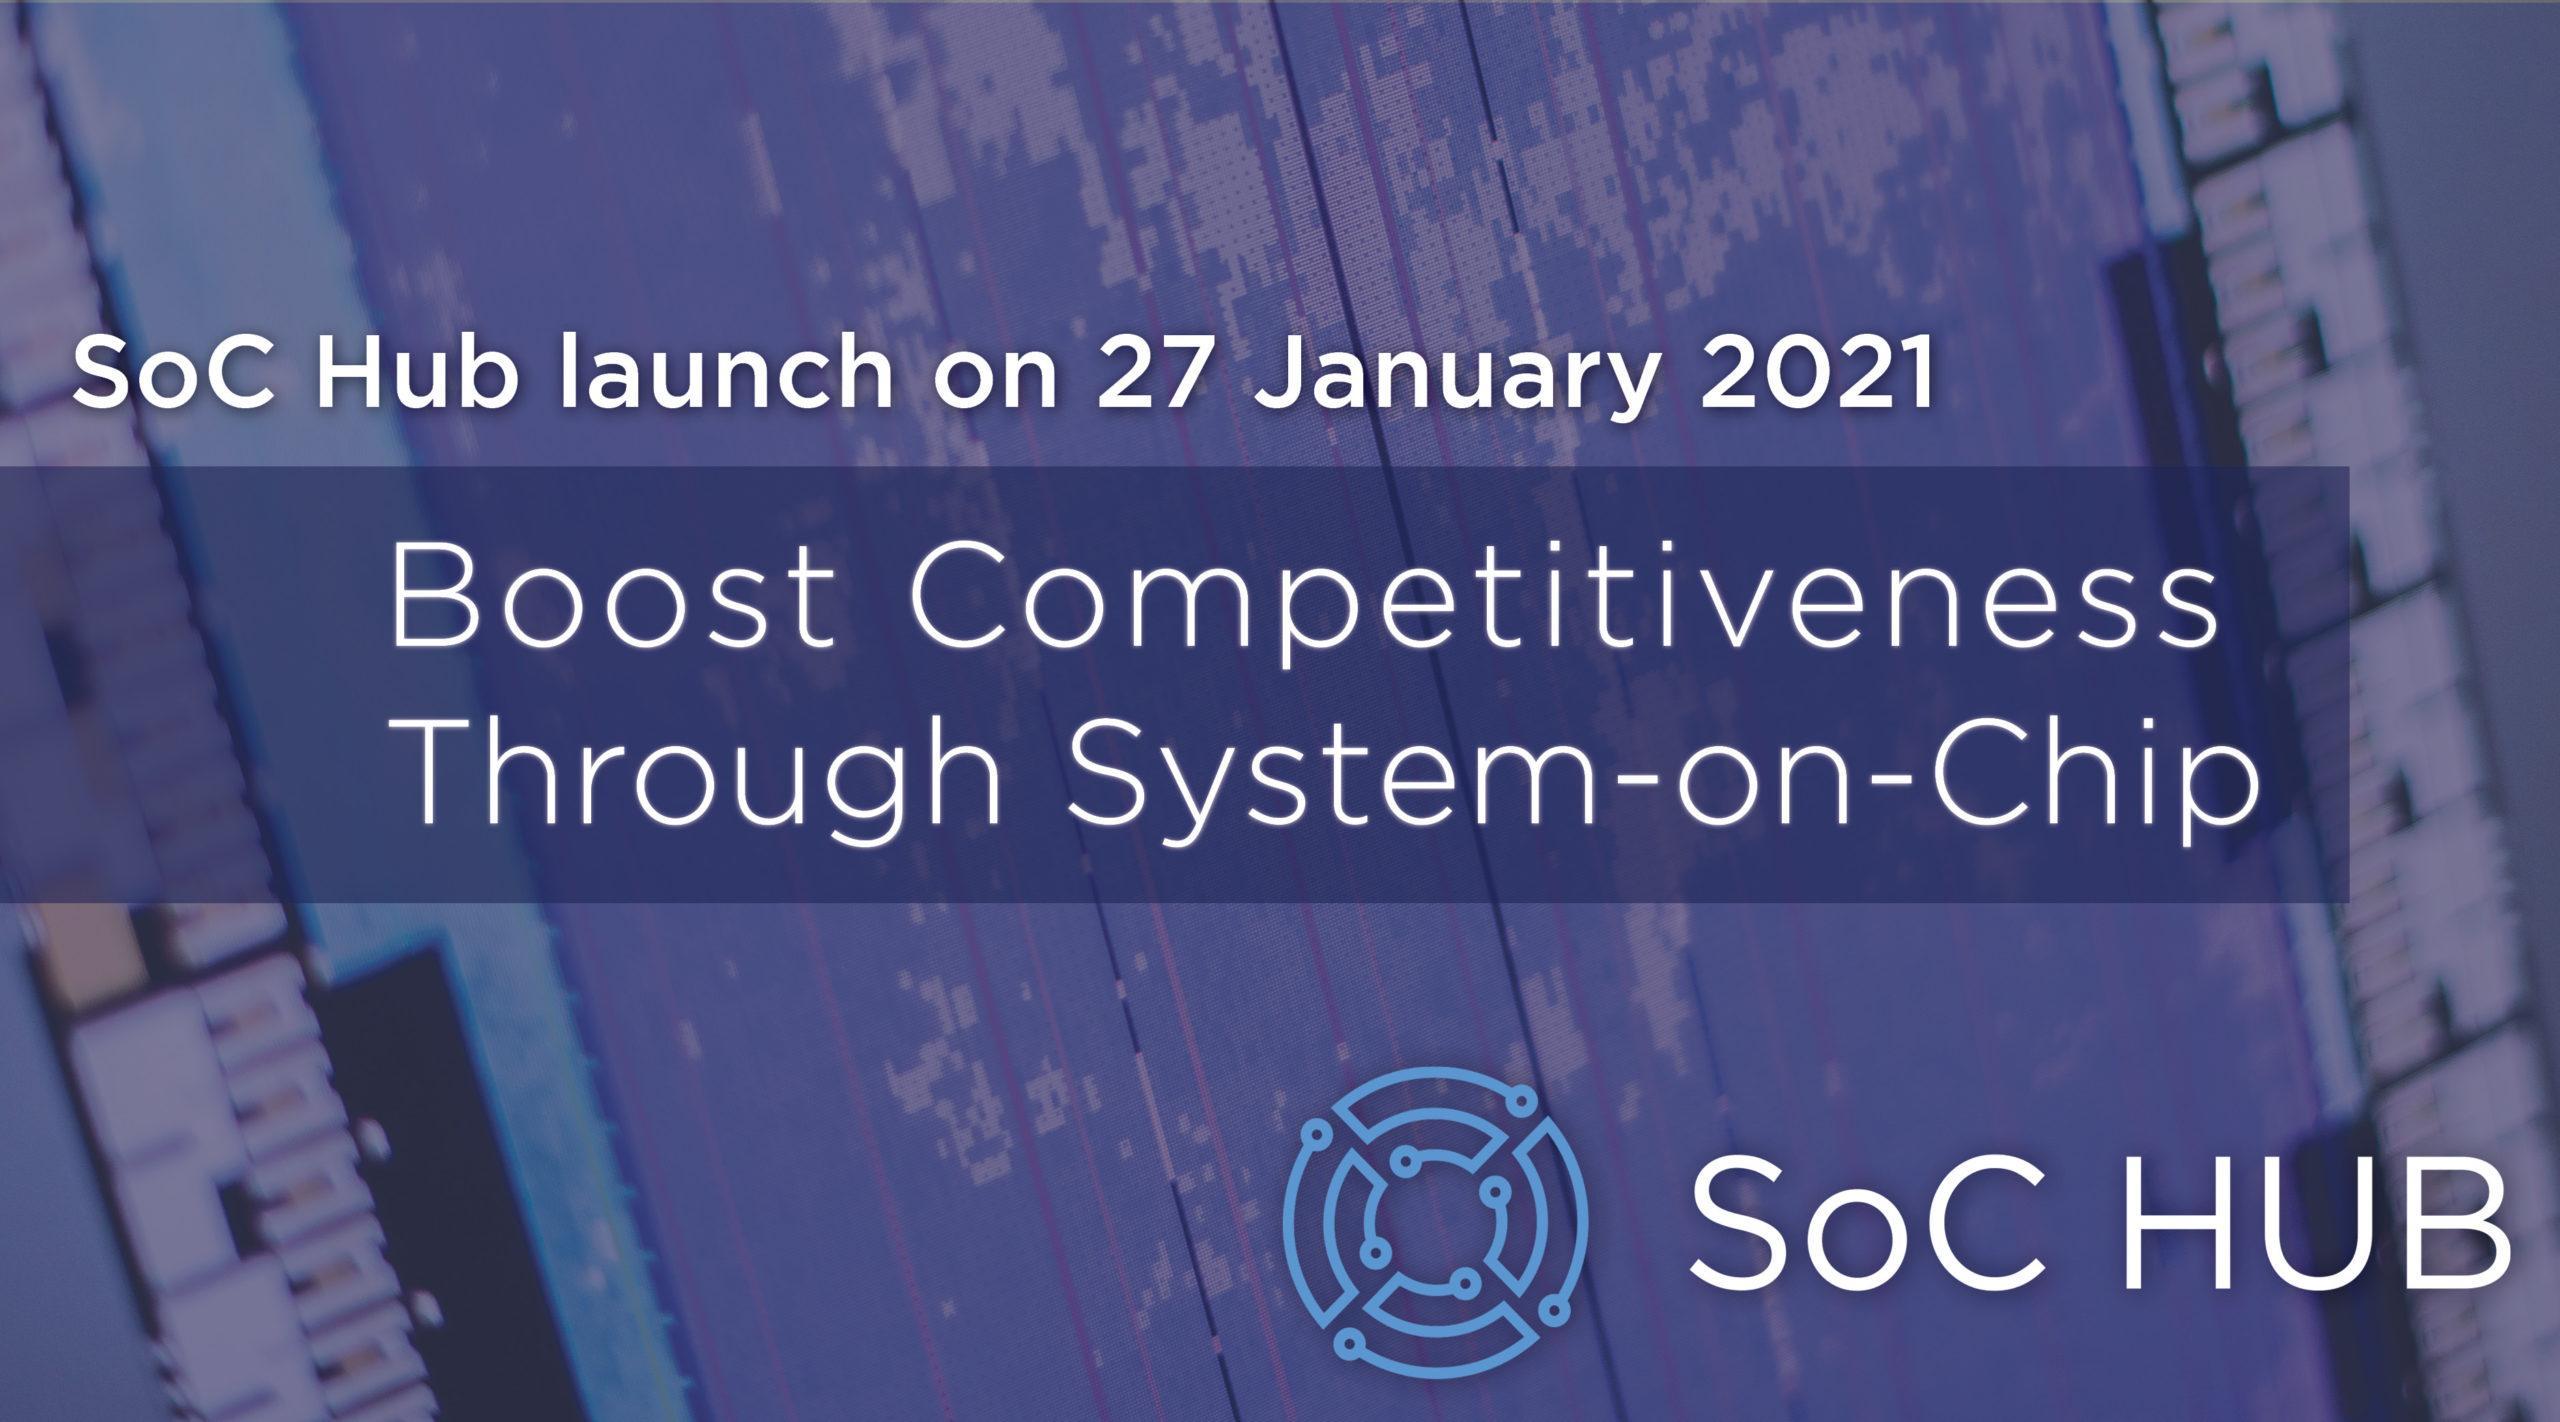 SoC Hub launc on 27 January 2021